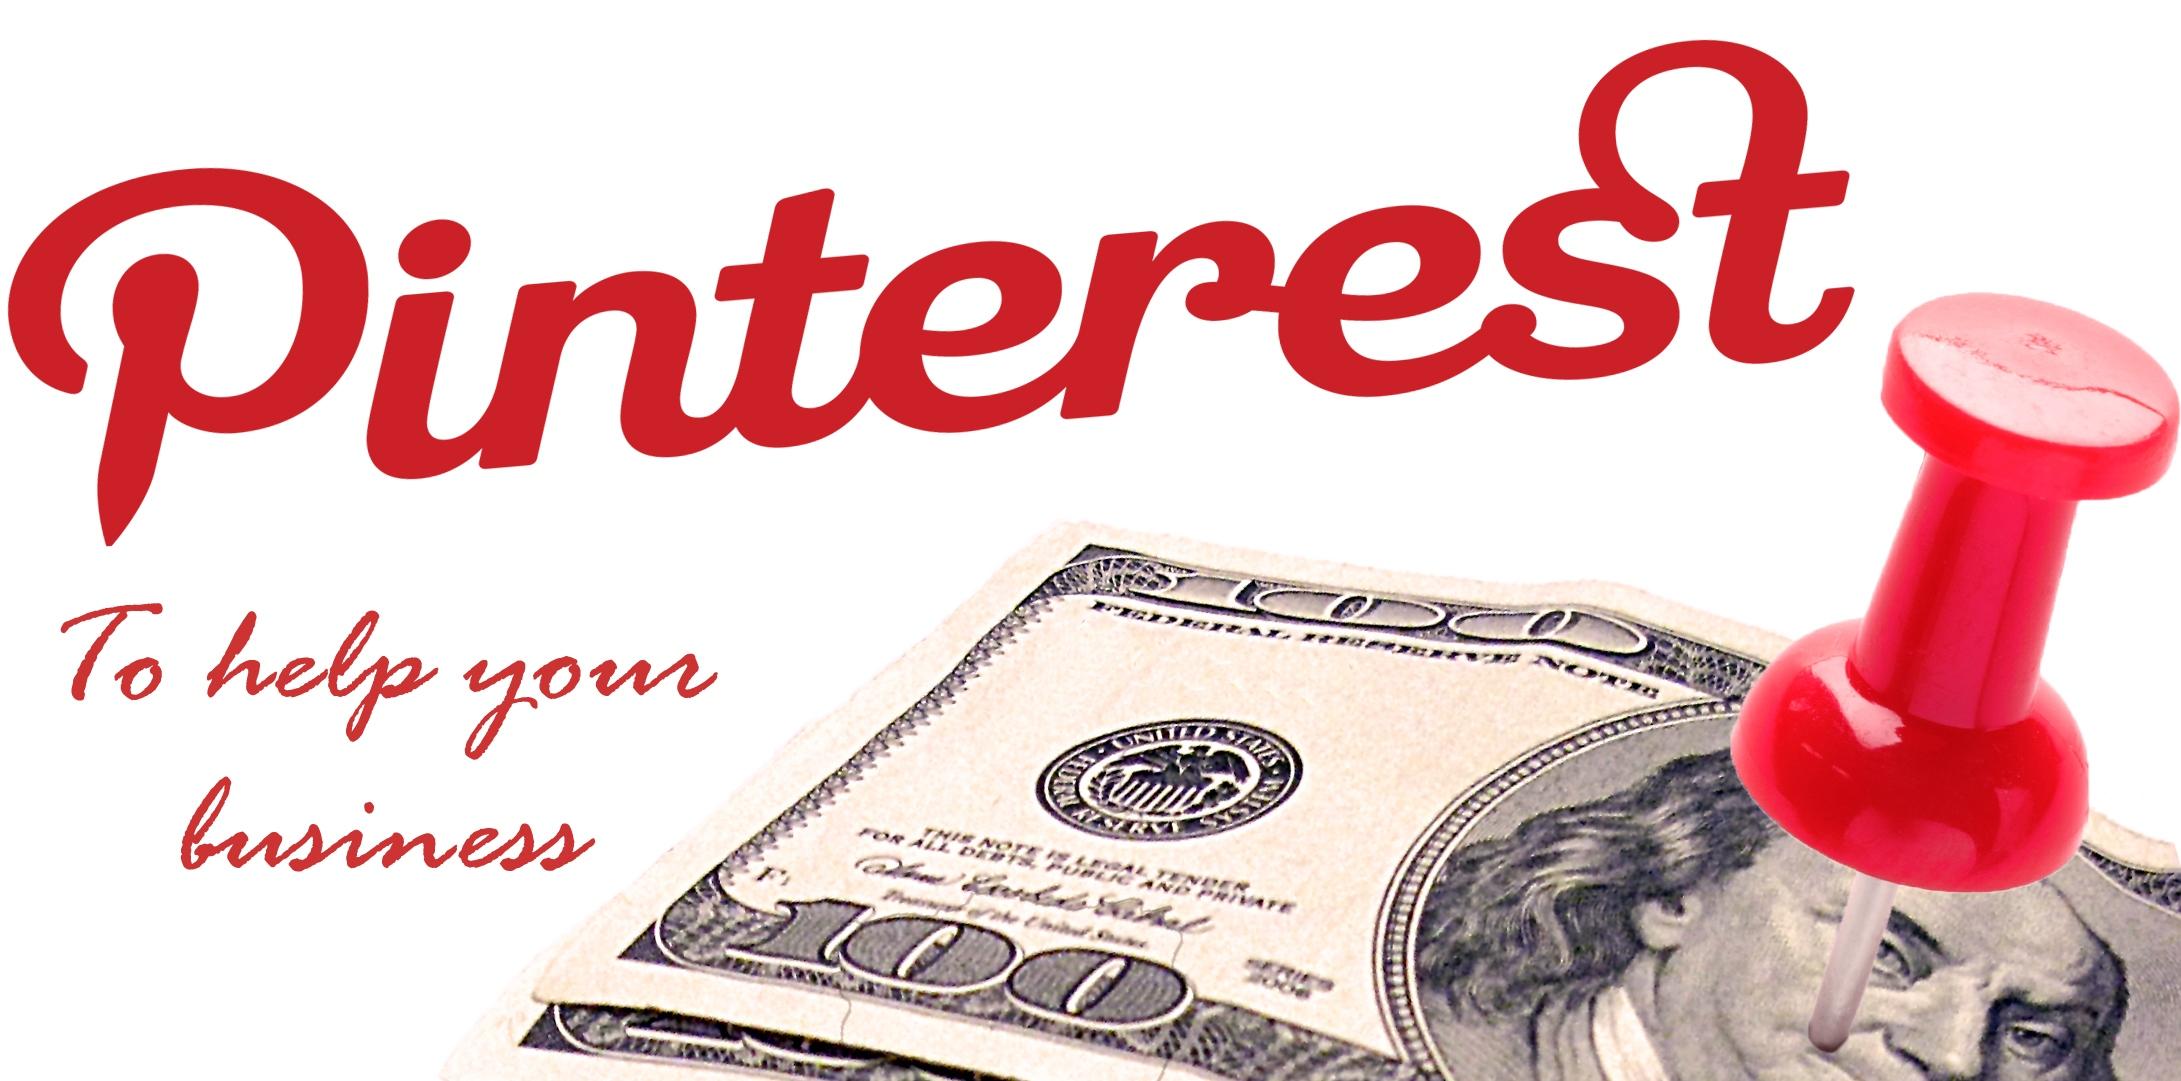 ¿Qué aporta Pinterest a mi negocio?